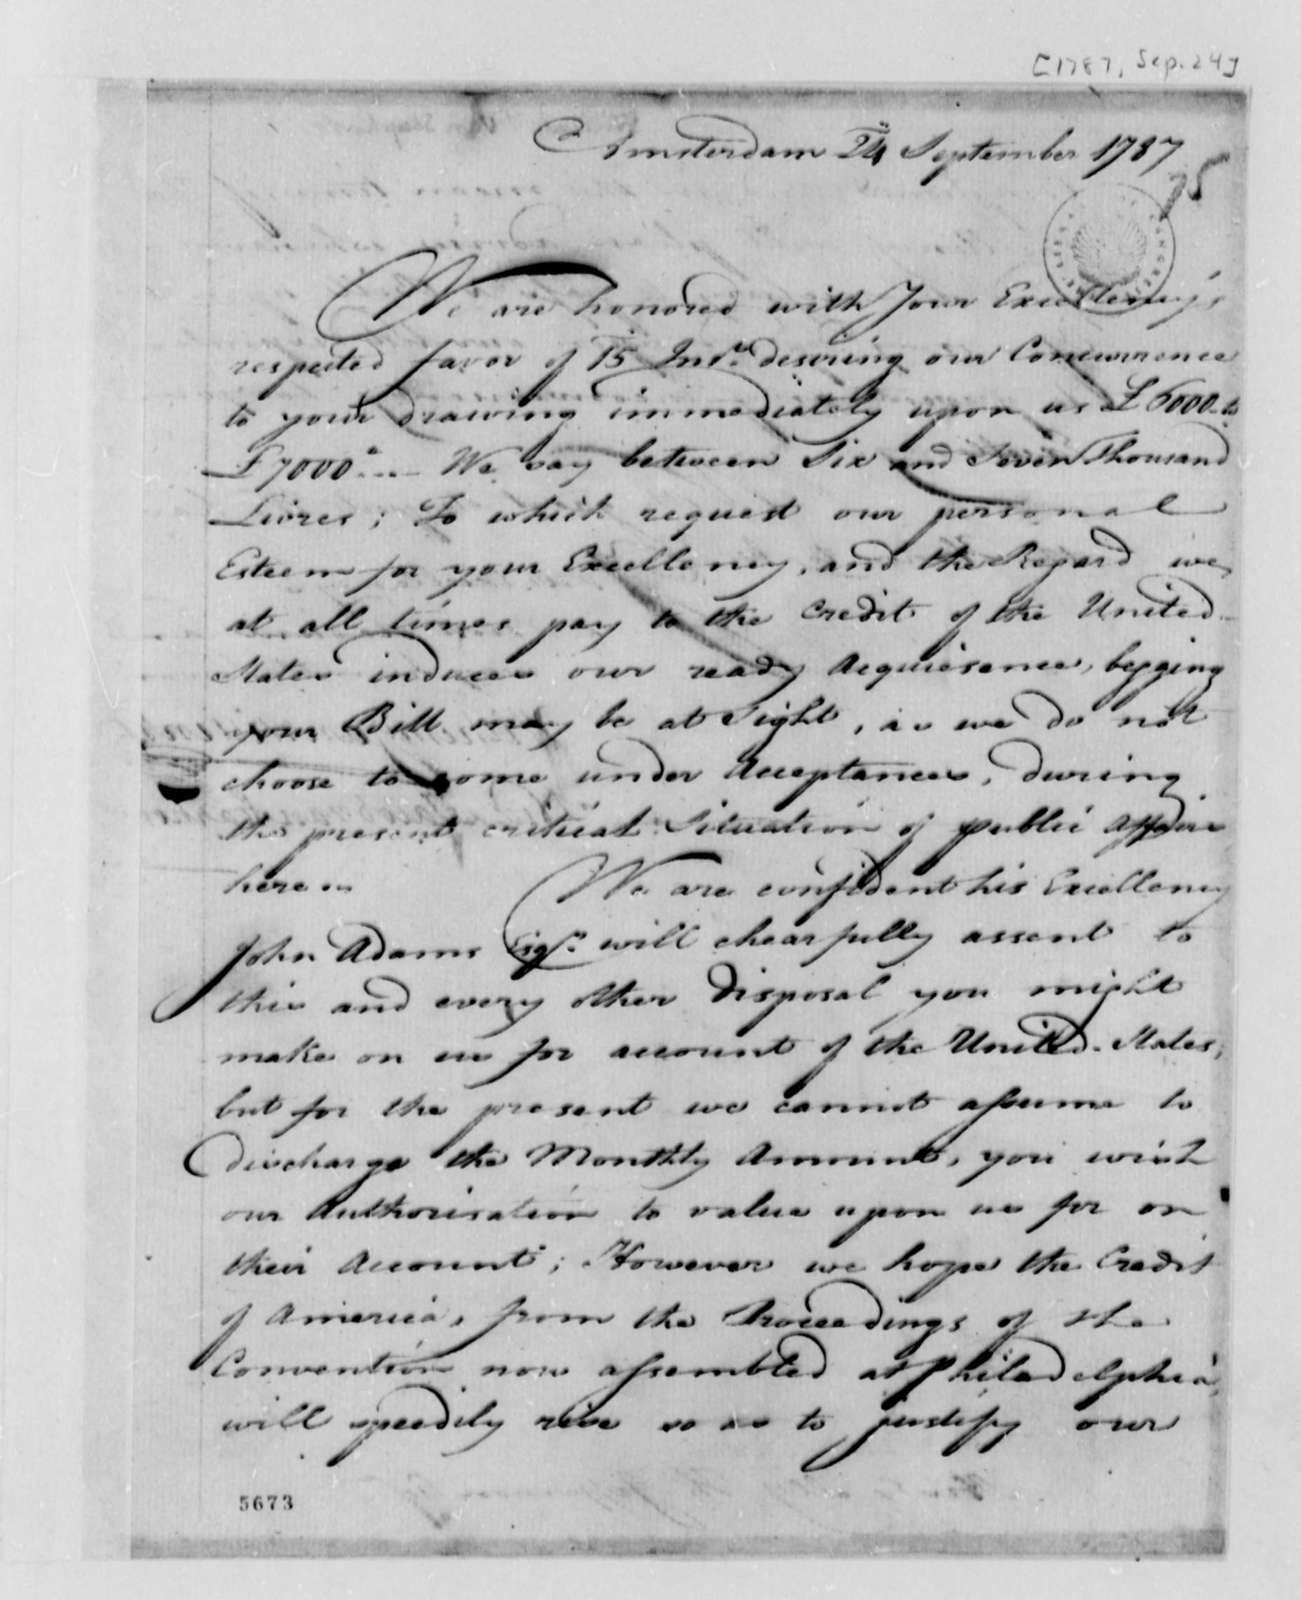 Wilhelm Willink, et al to Thomas Jefferson, September 24, 1787